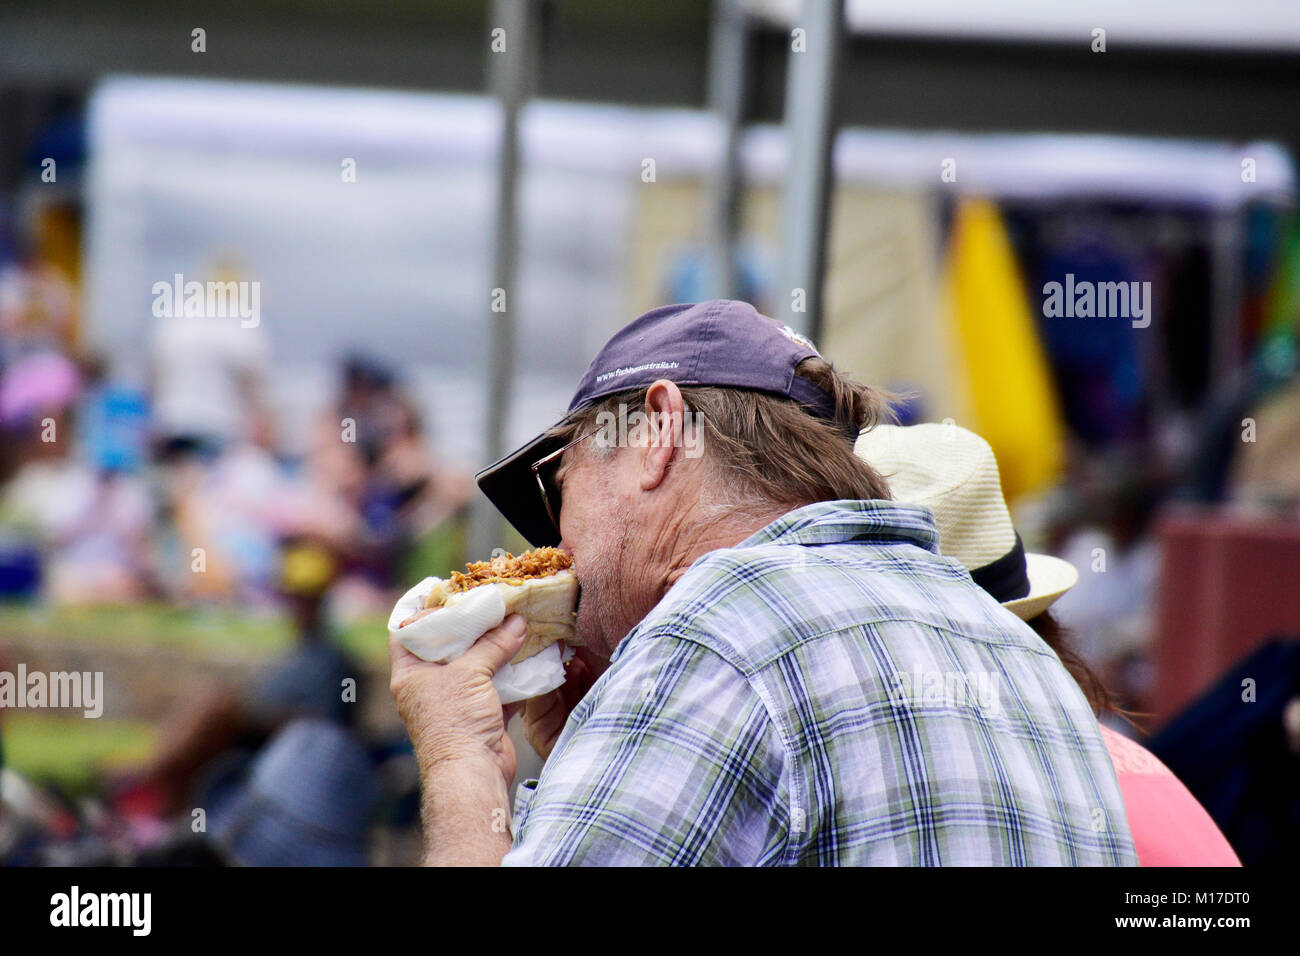 MATURE MAN EATING A HOT DOG - Stock Image